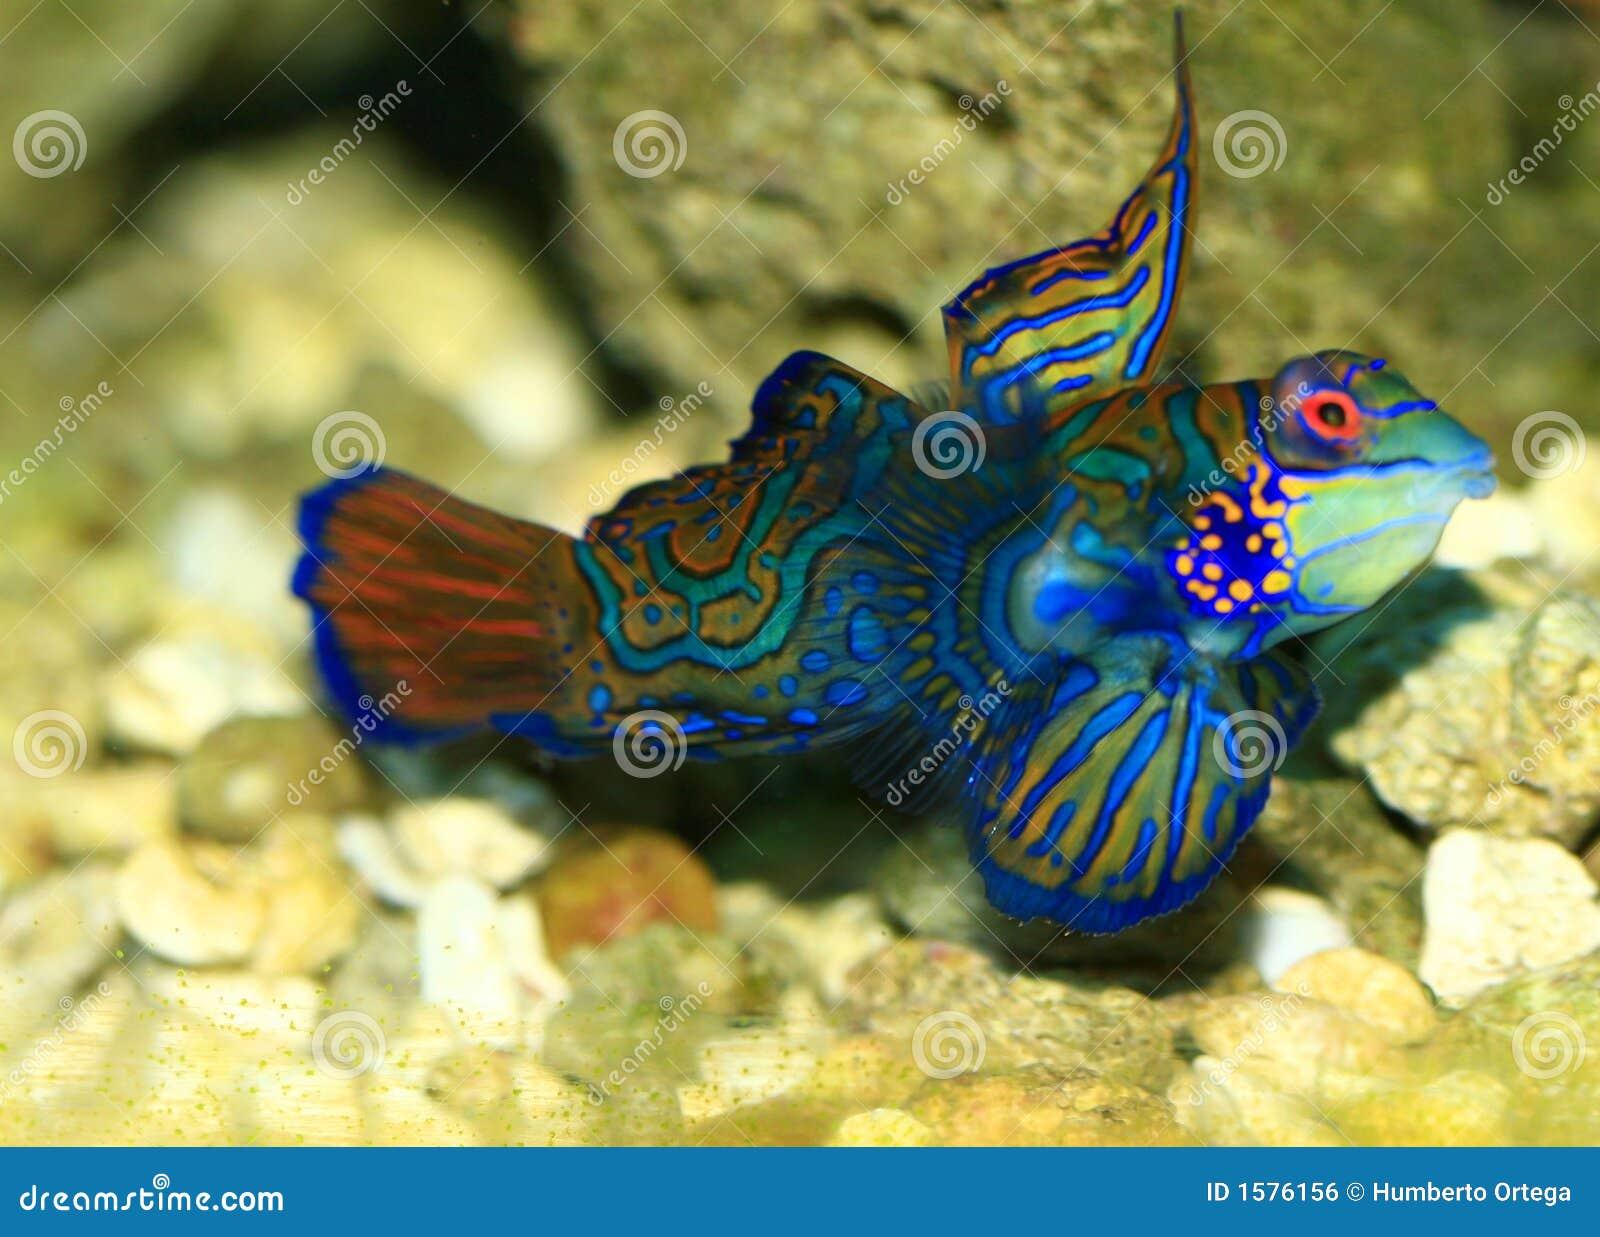 Tropical Fish Royalty Free Stock Image - Image: 1576156